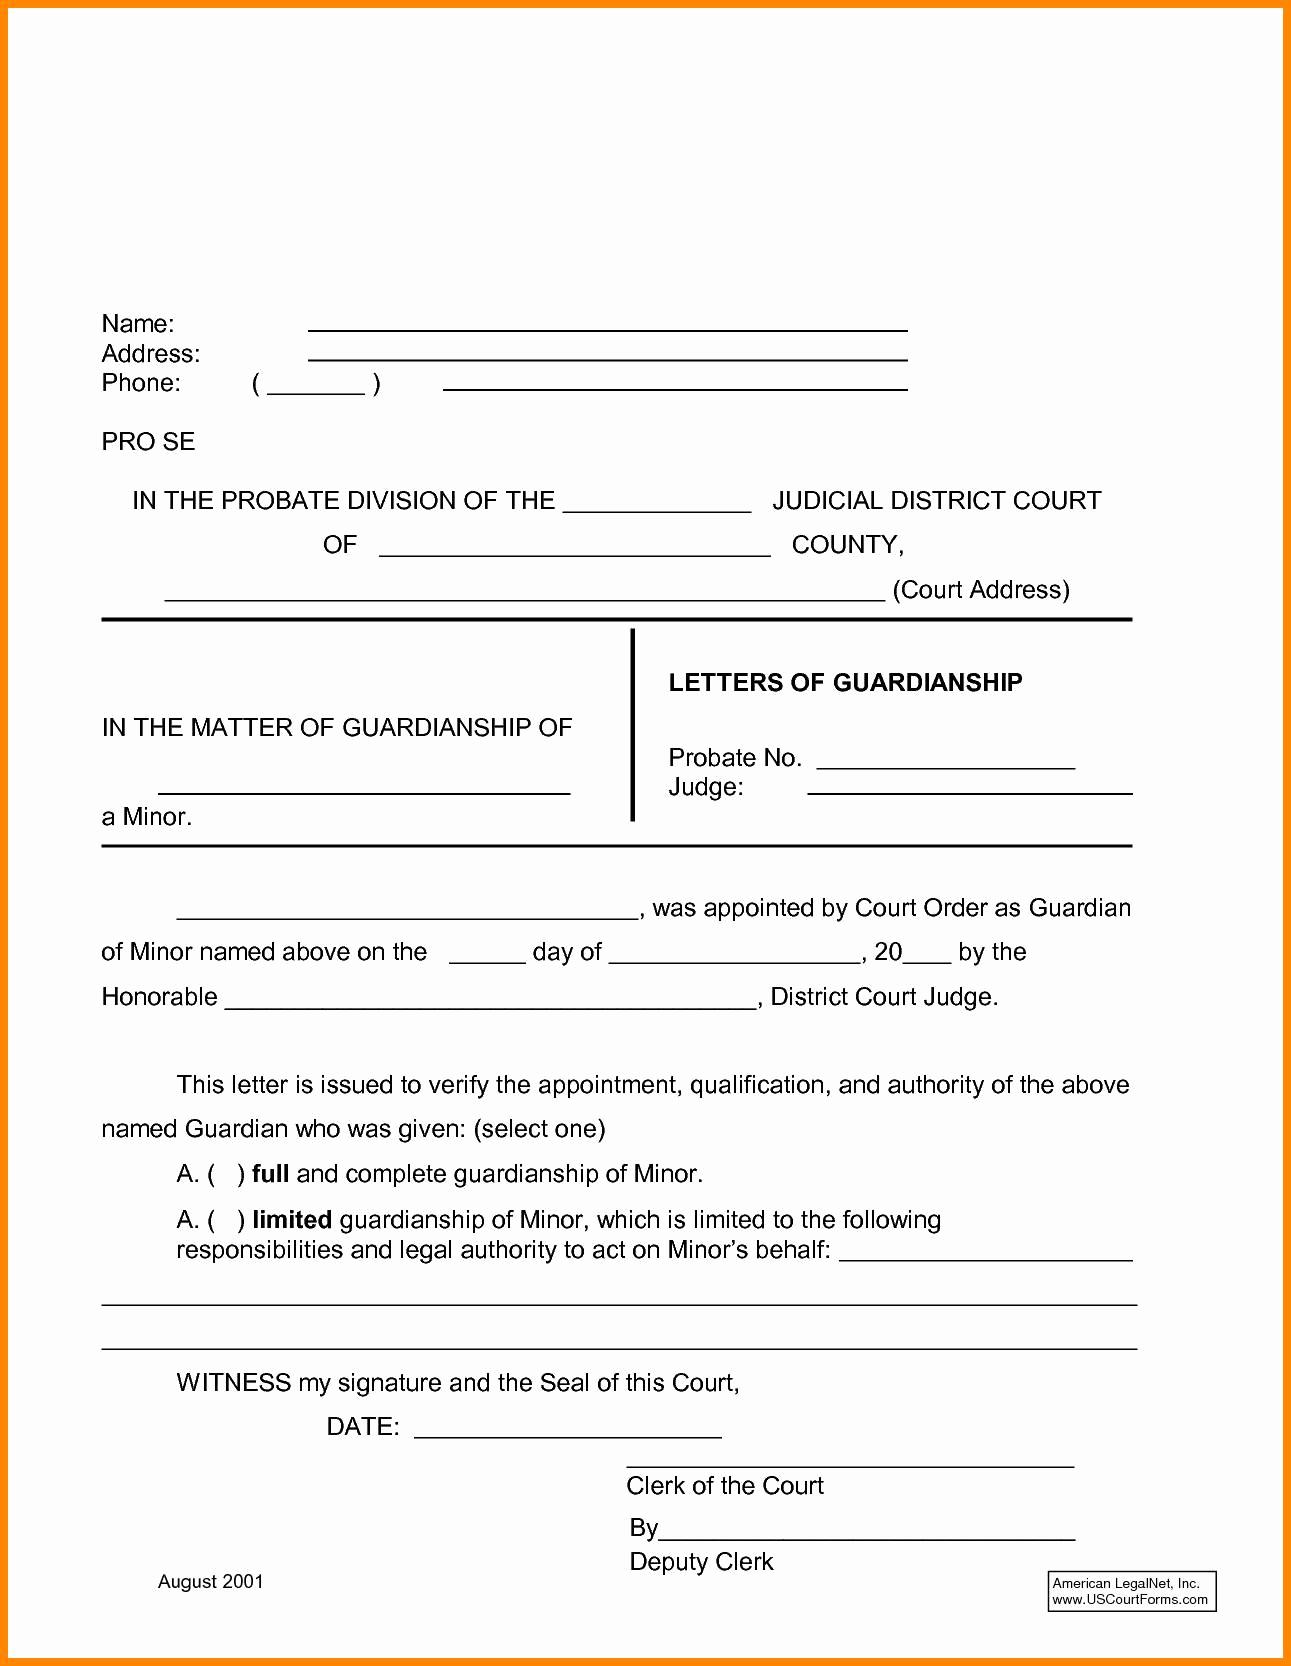 Legal Guardianship Letter Template Samples